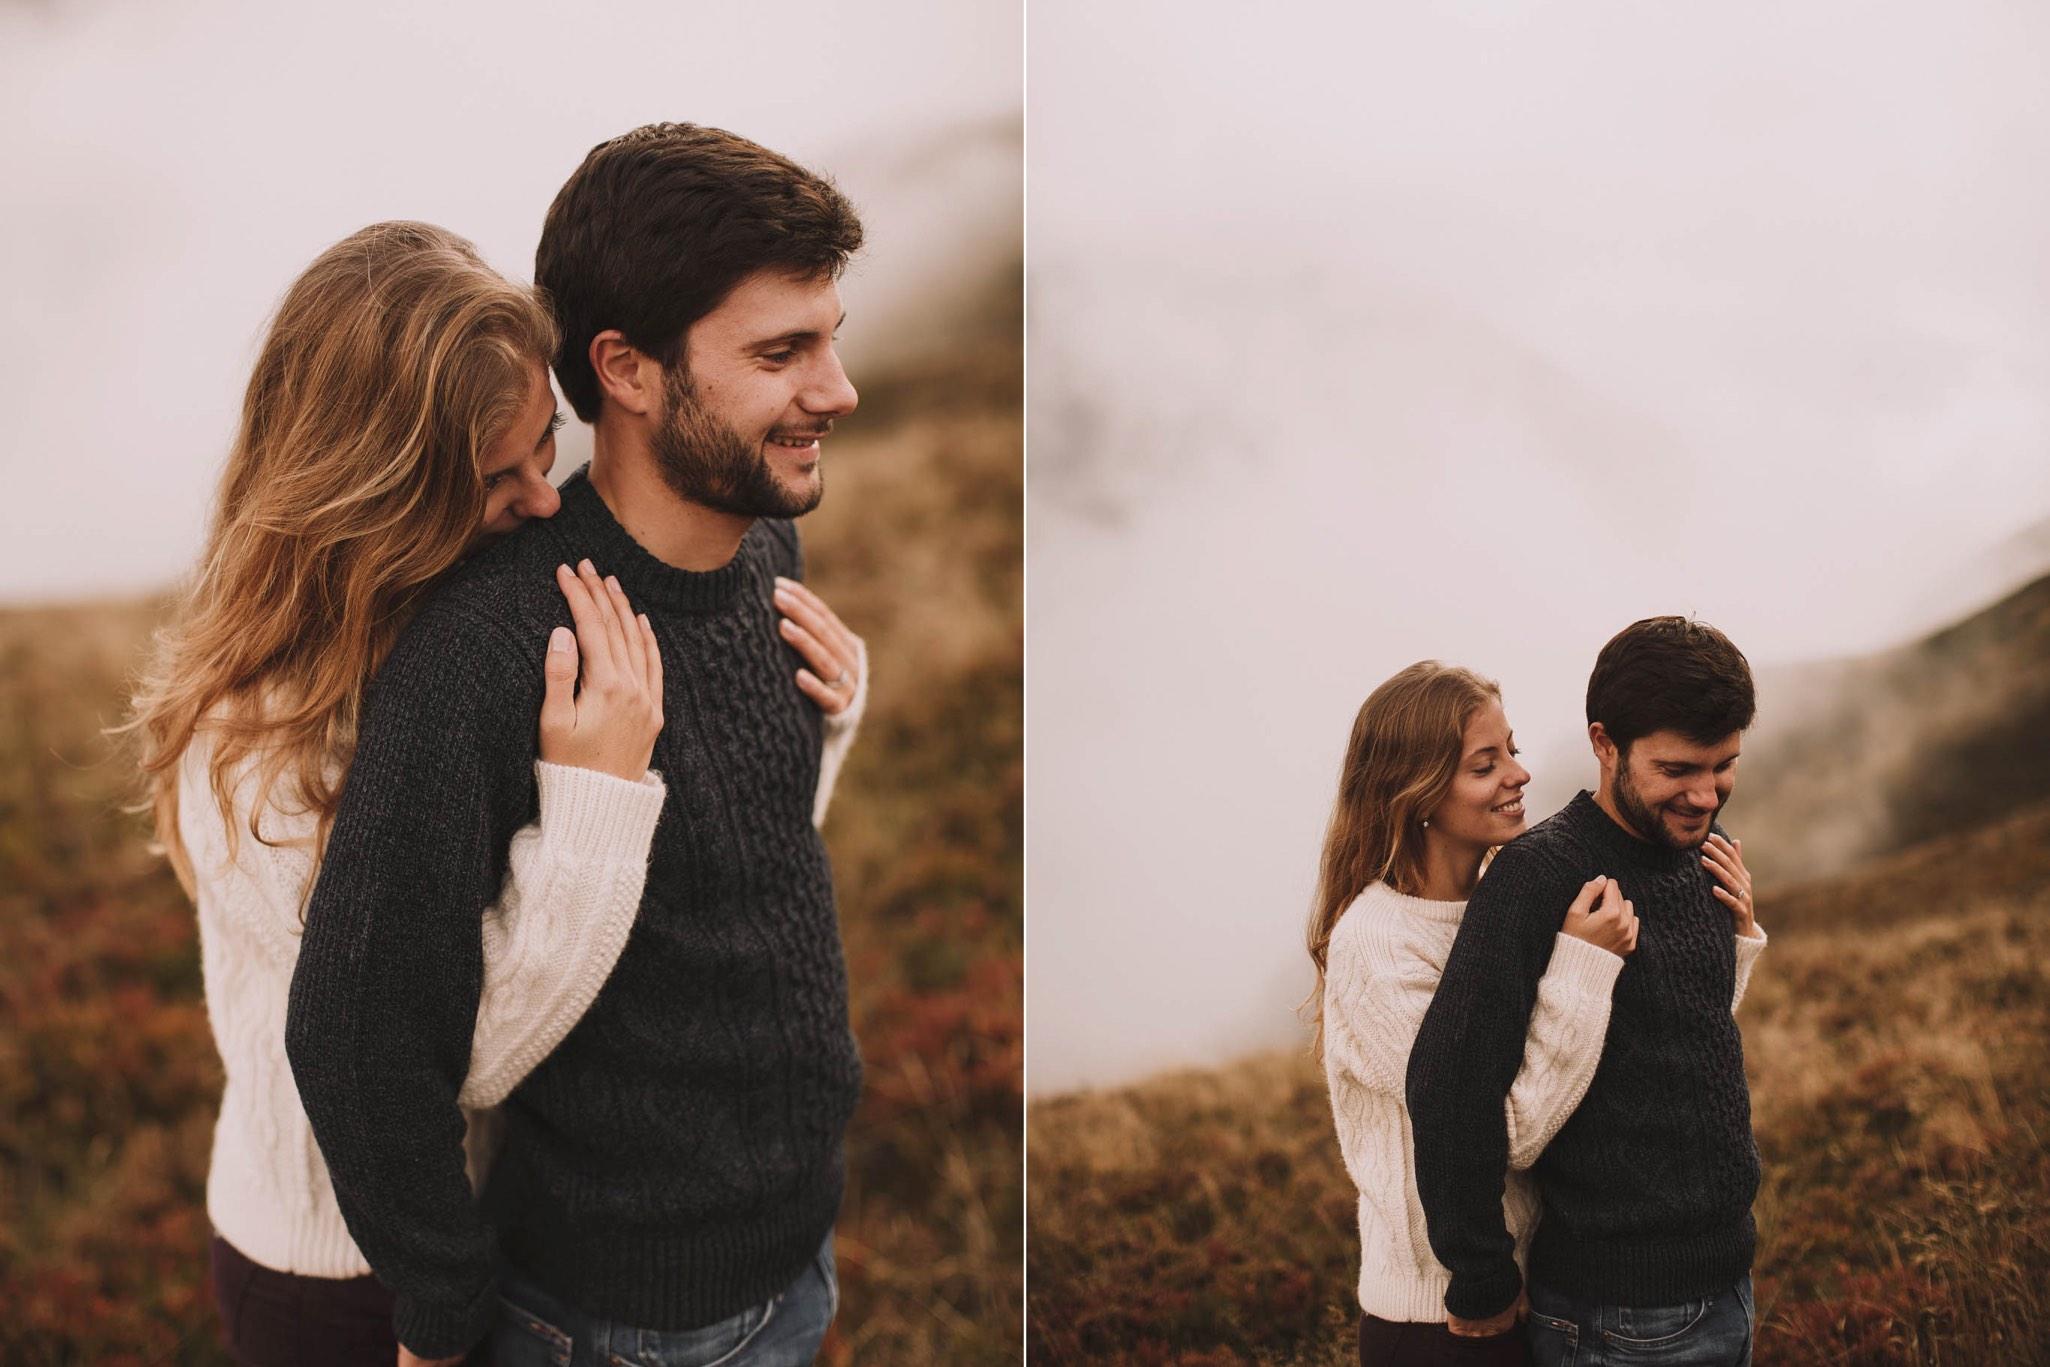 Pyrénées-mountains-wedding-photographer-jeremy-boyer-montagne-engagement-session-love-couple-29.jpg